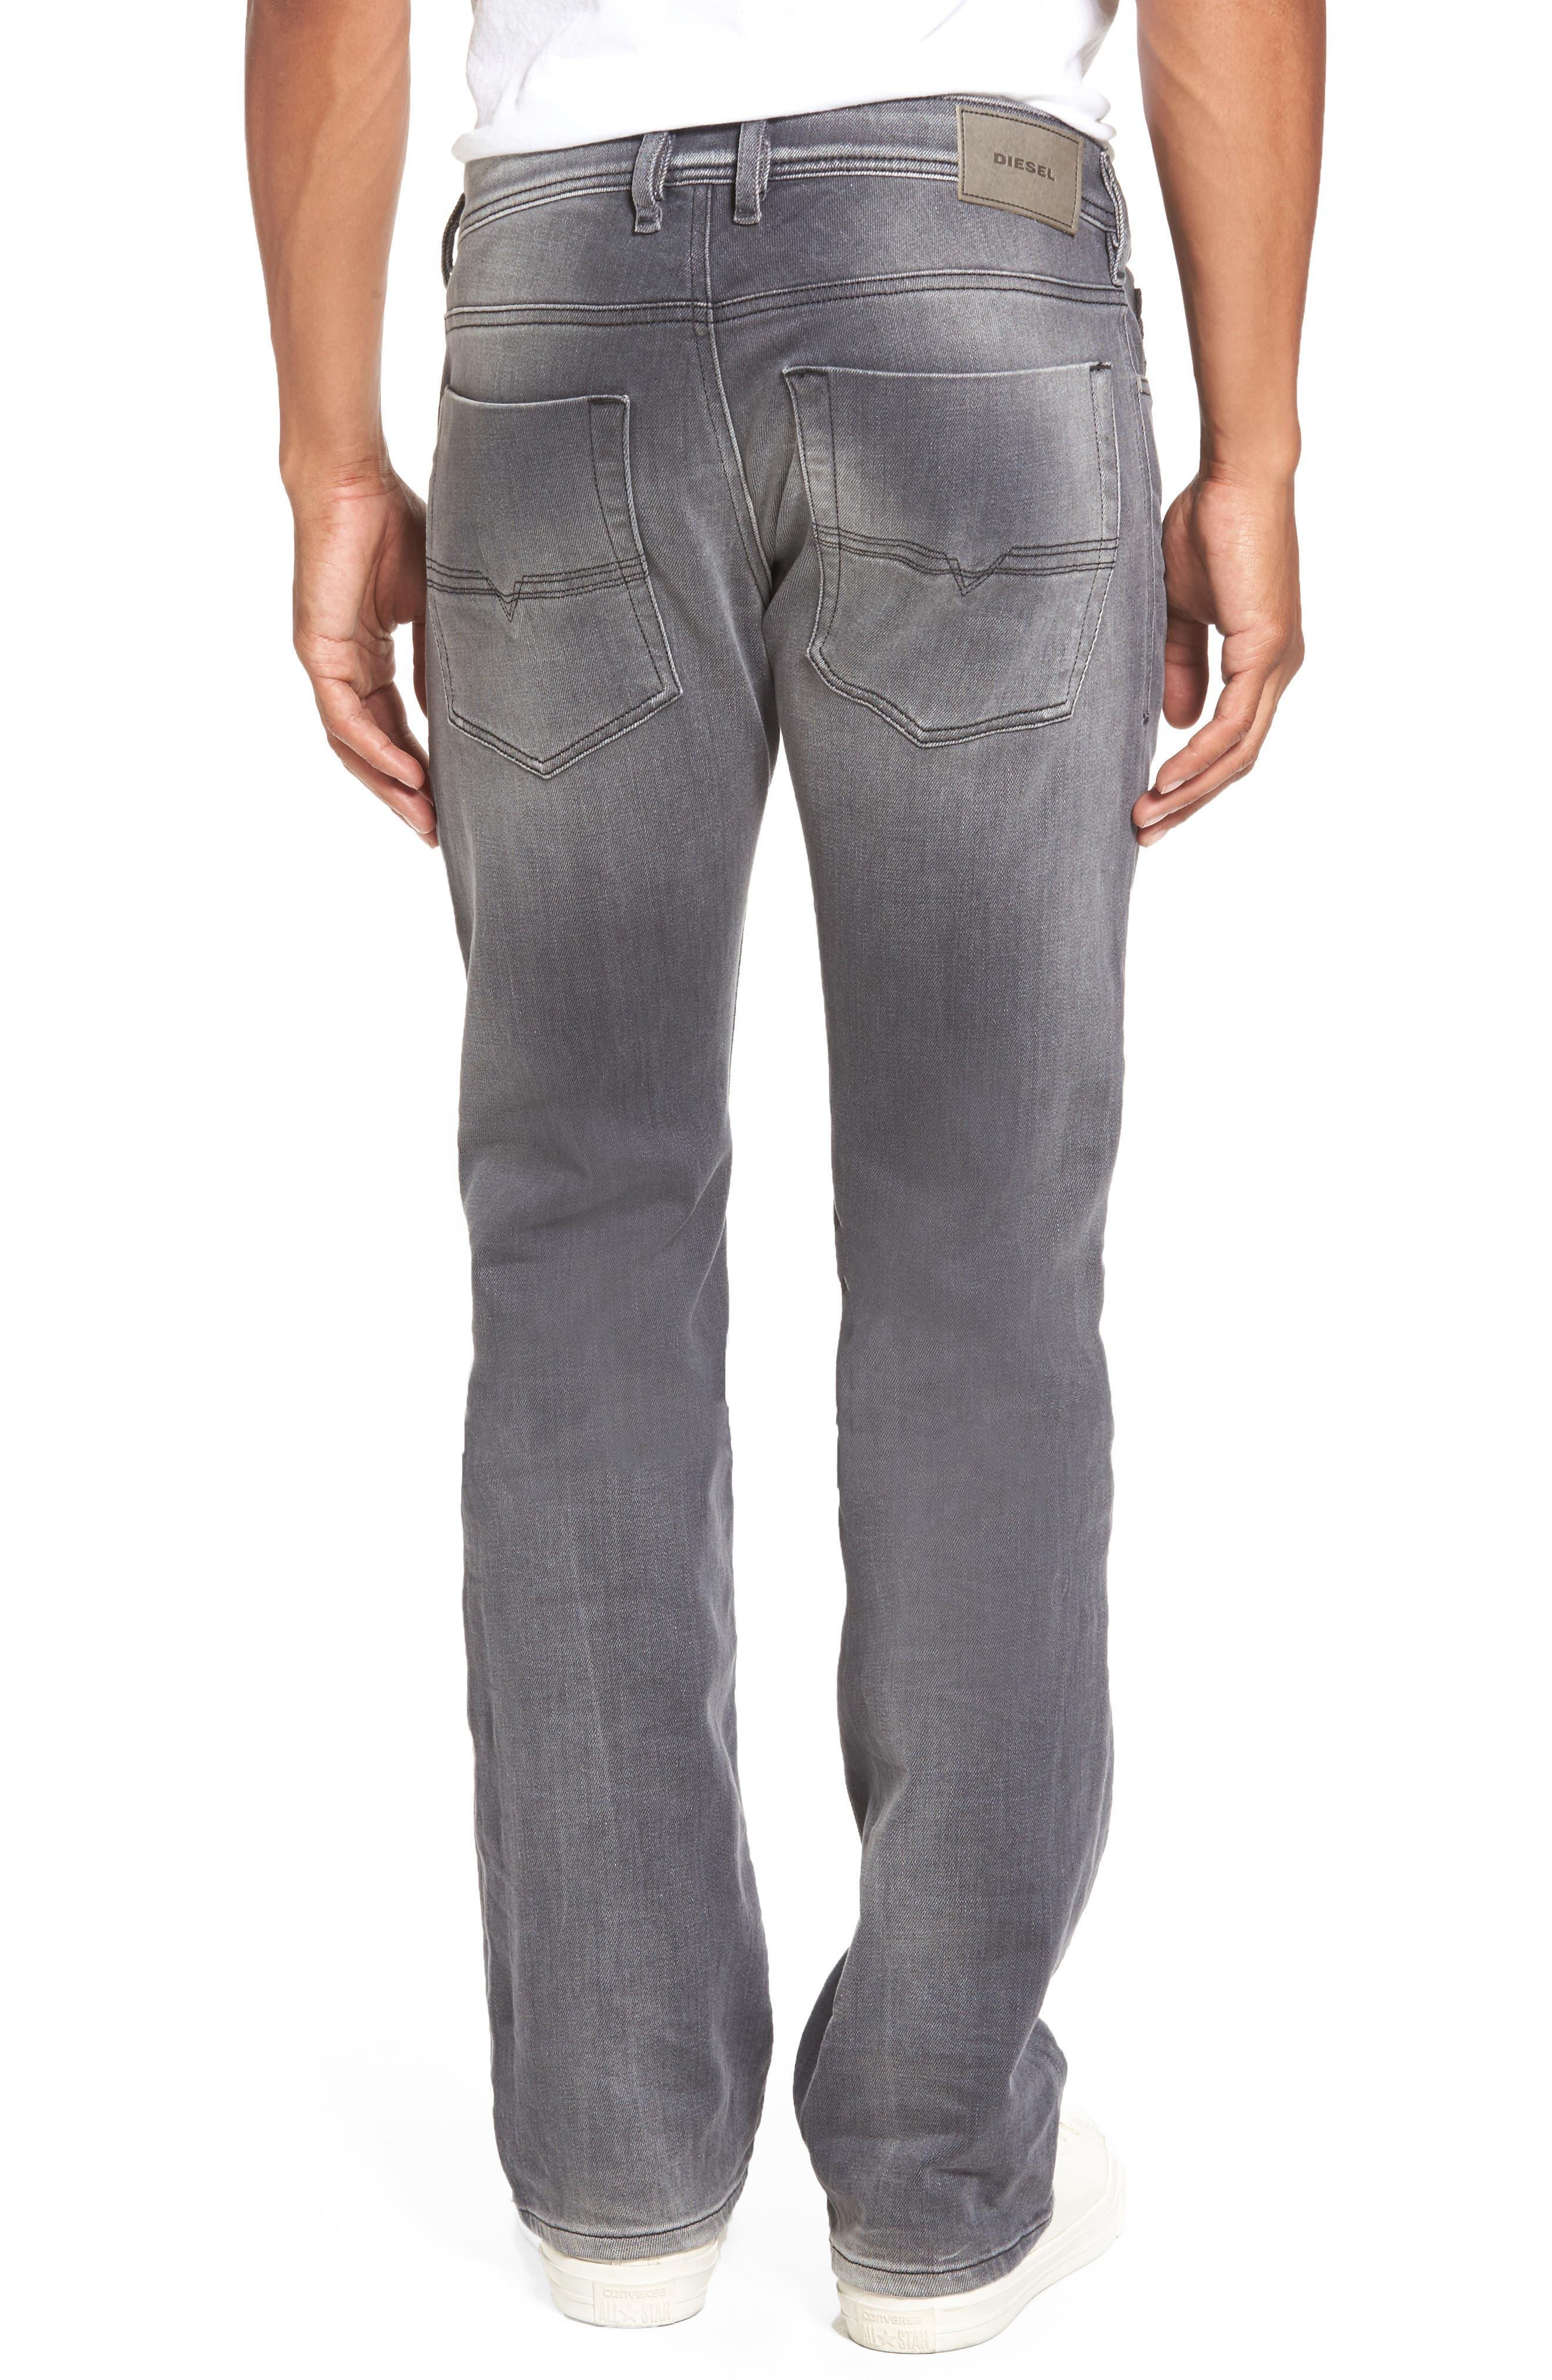 Alternate Image 2  - DIESEL® Zatiny Bootcut Jeans (84JK)